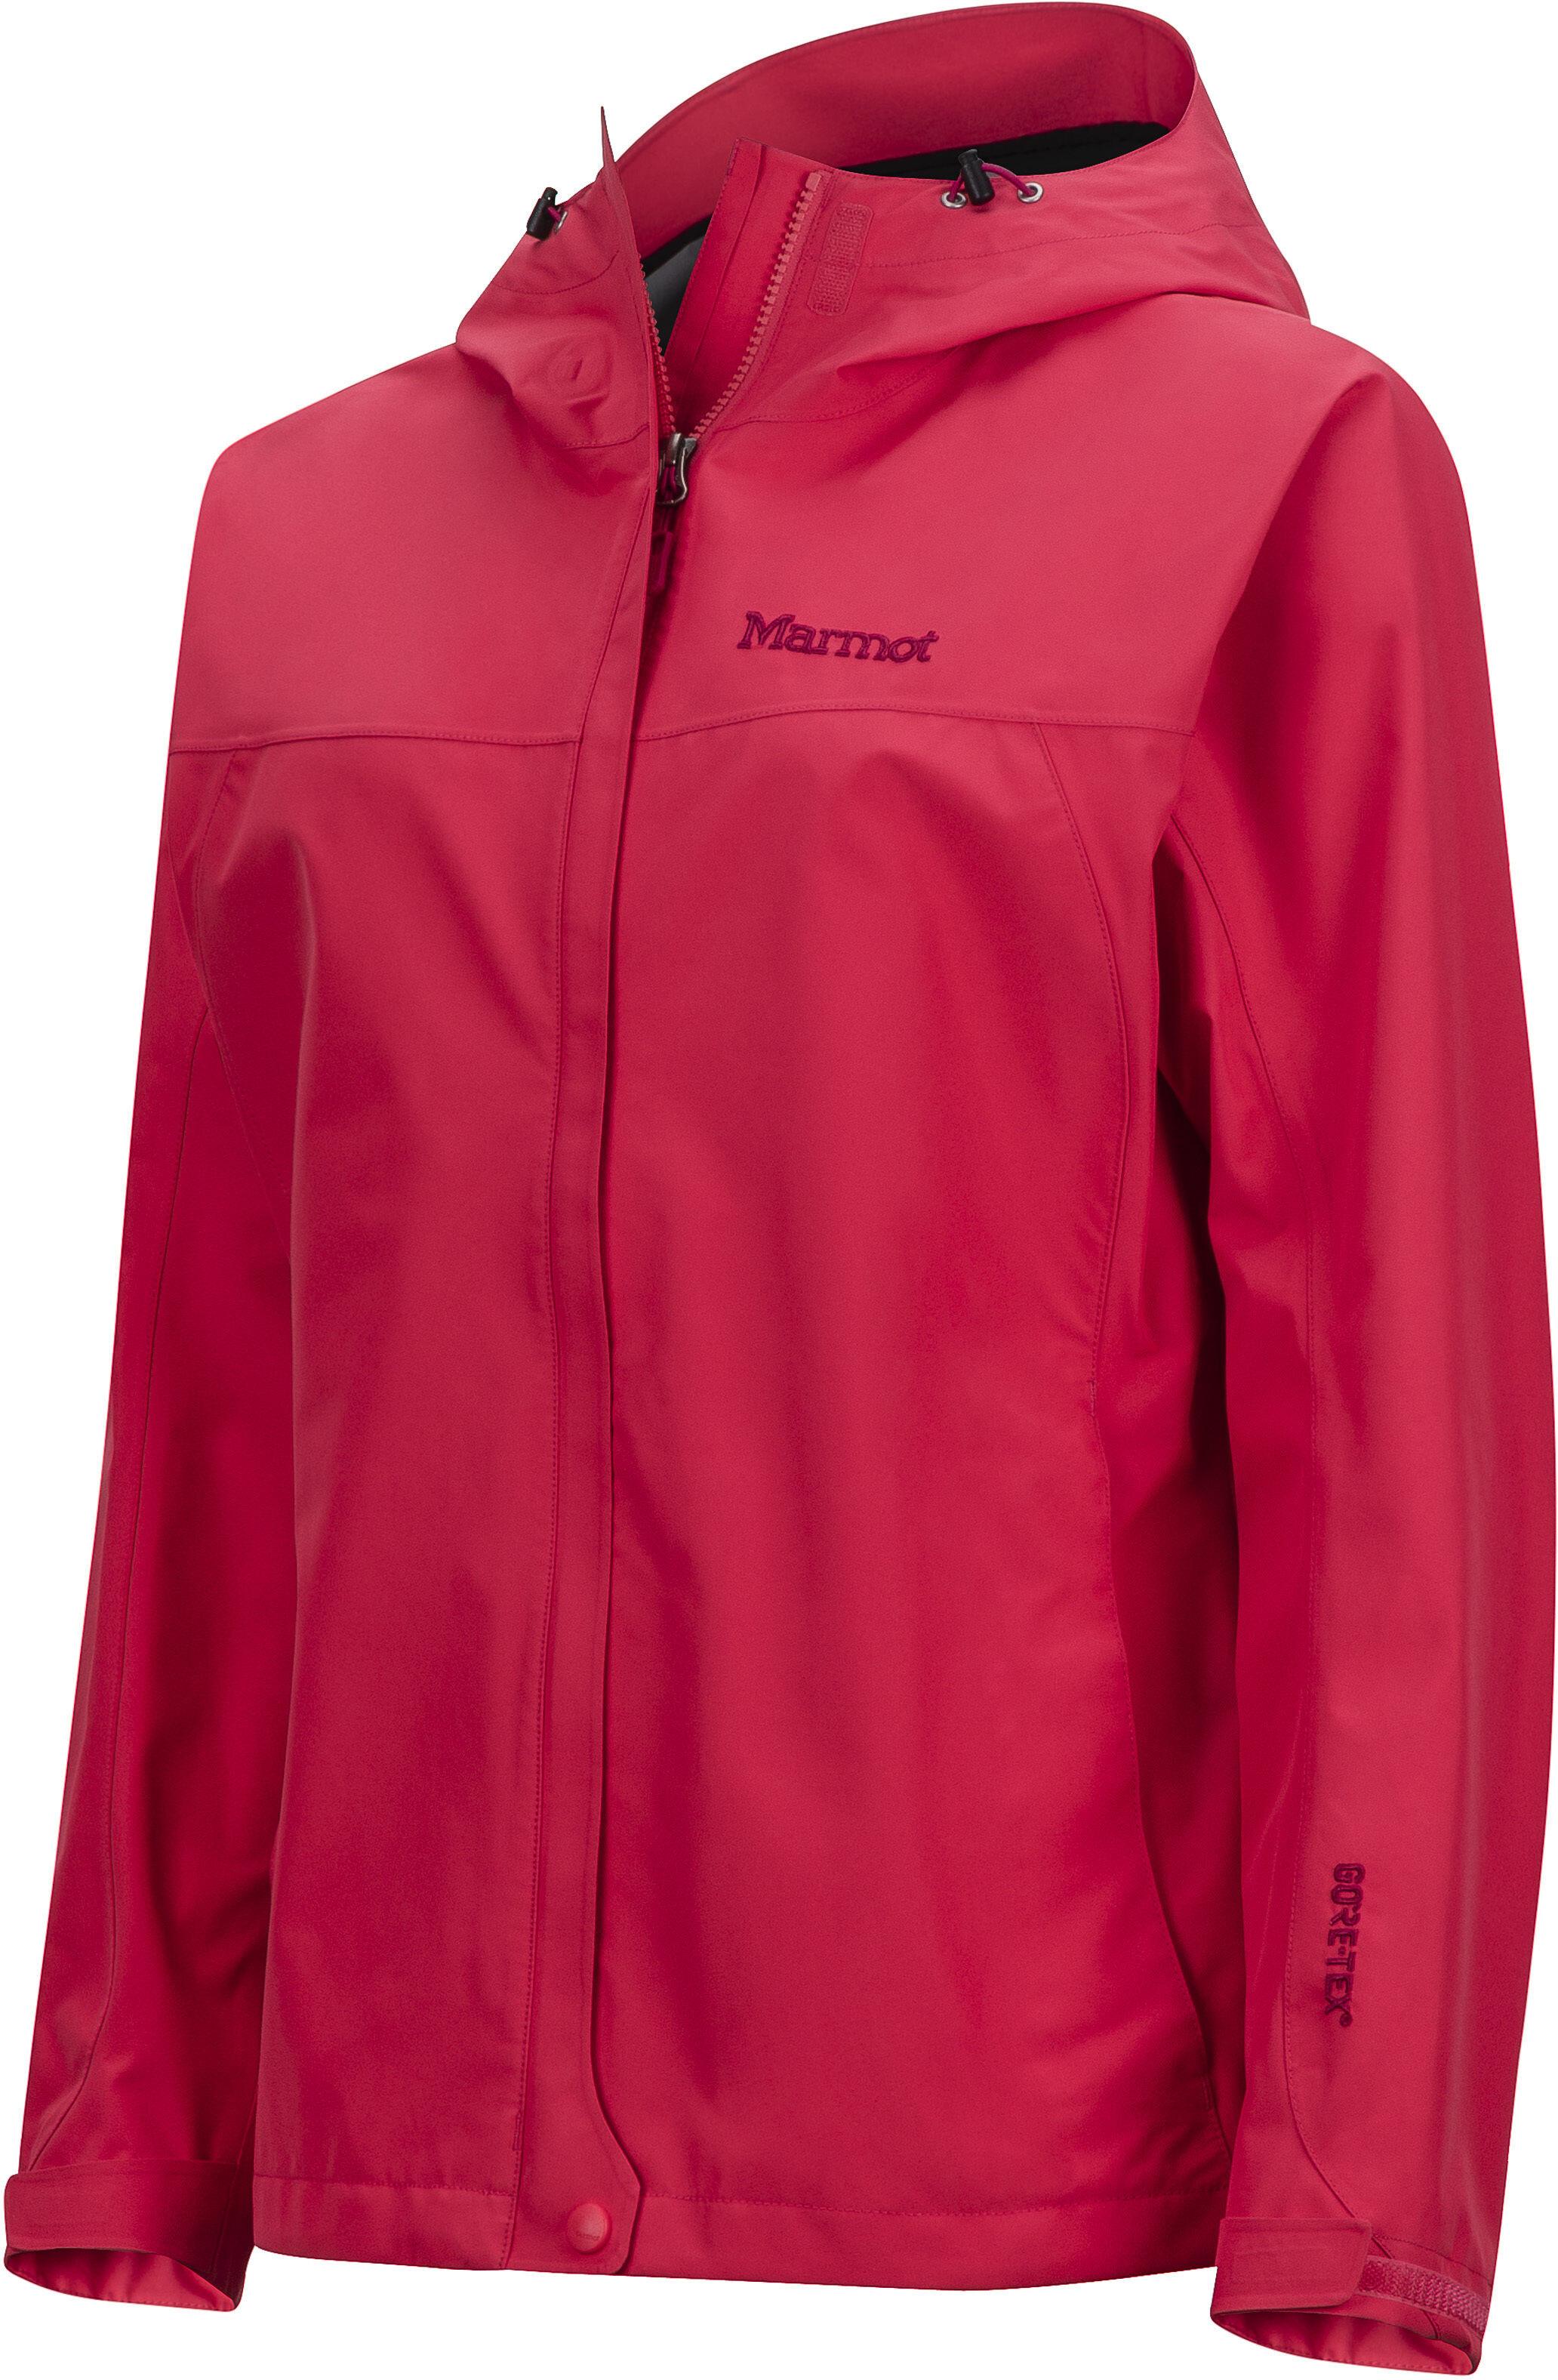 Marmot Women S Alexie Jacket: Marmot Minimalist Jacket Women Hibiscus